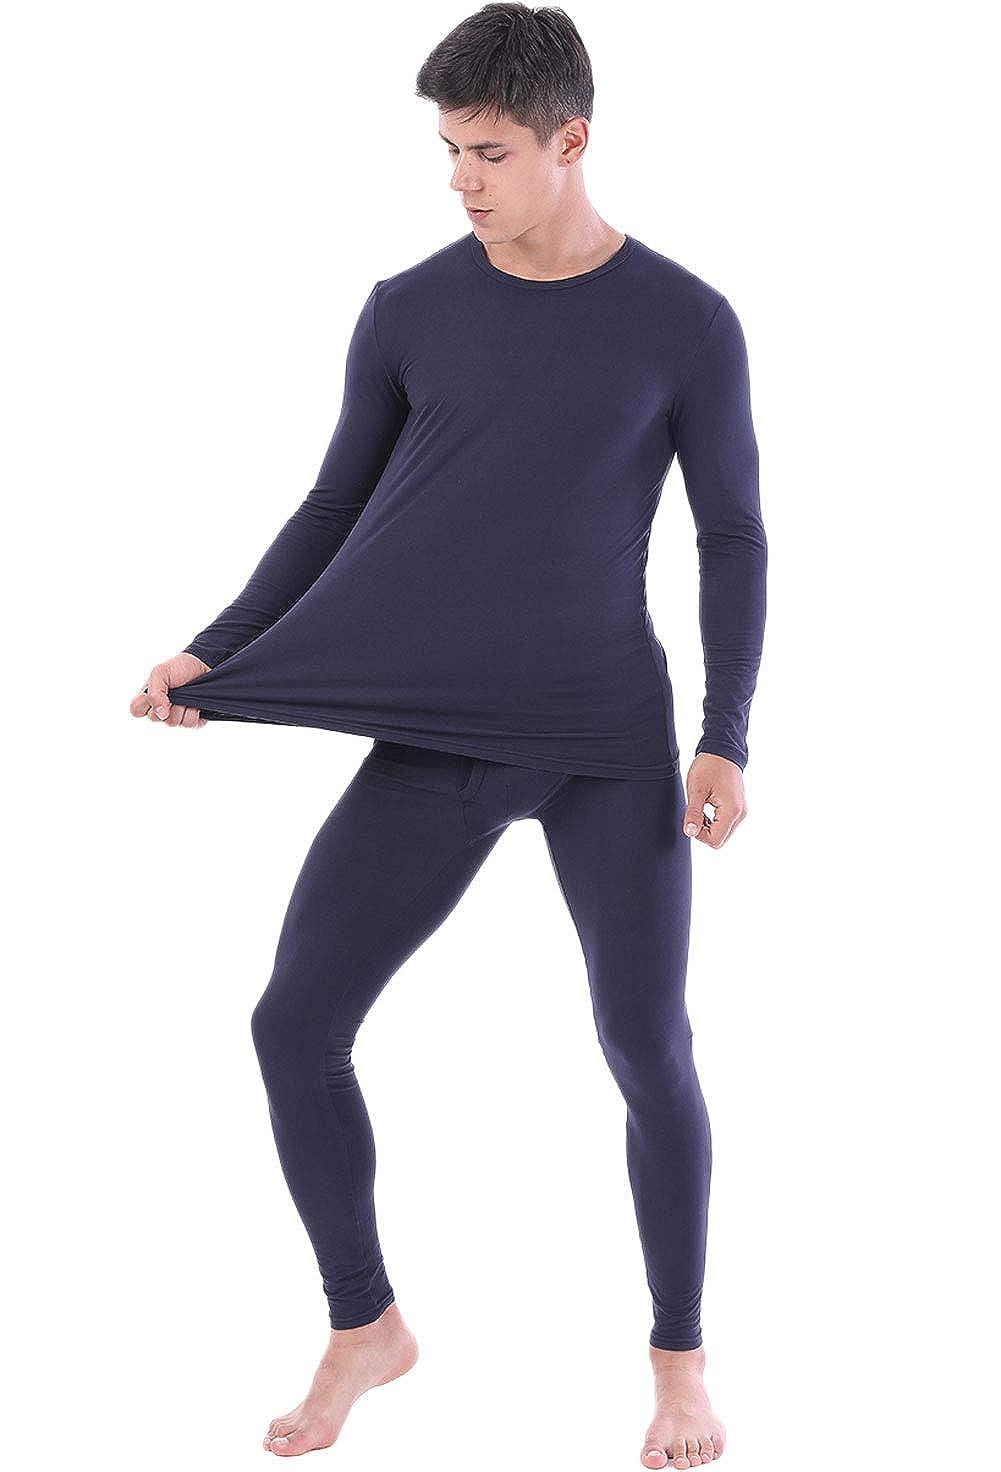 2Pcs//Set Women Soft Winter Warm Underwear Tops Bottoming Pajamas Set Long Pants